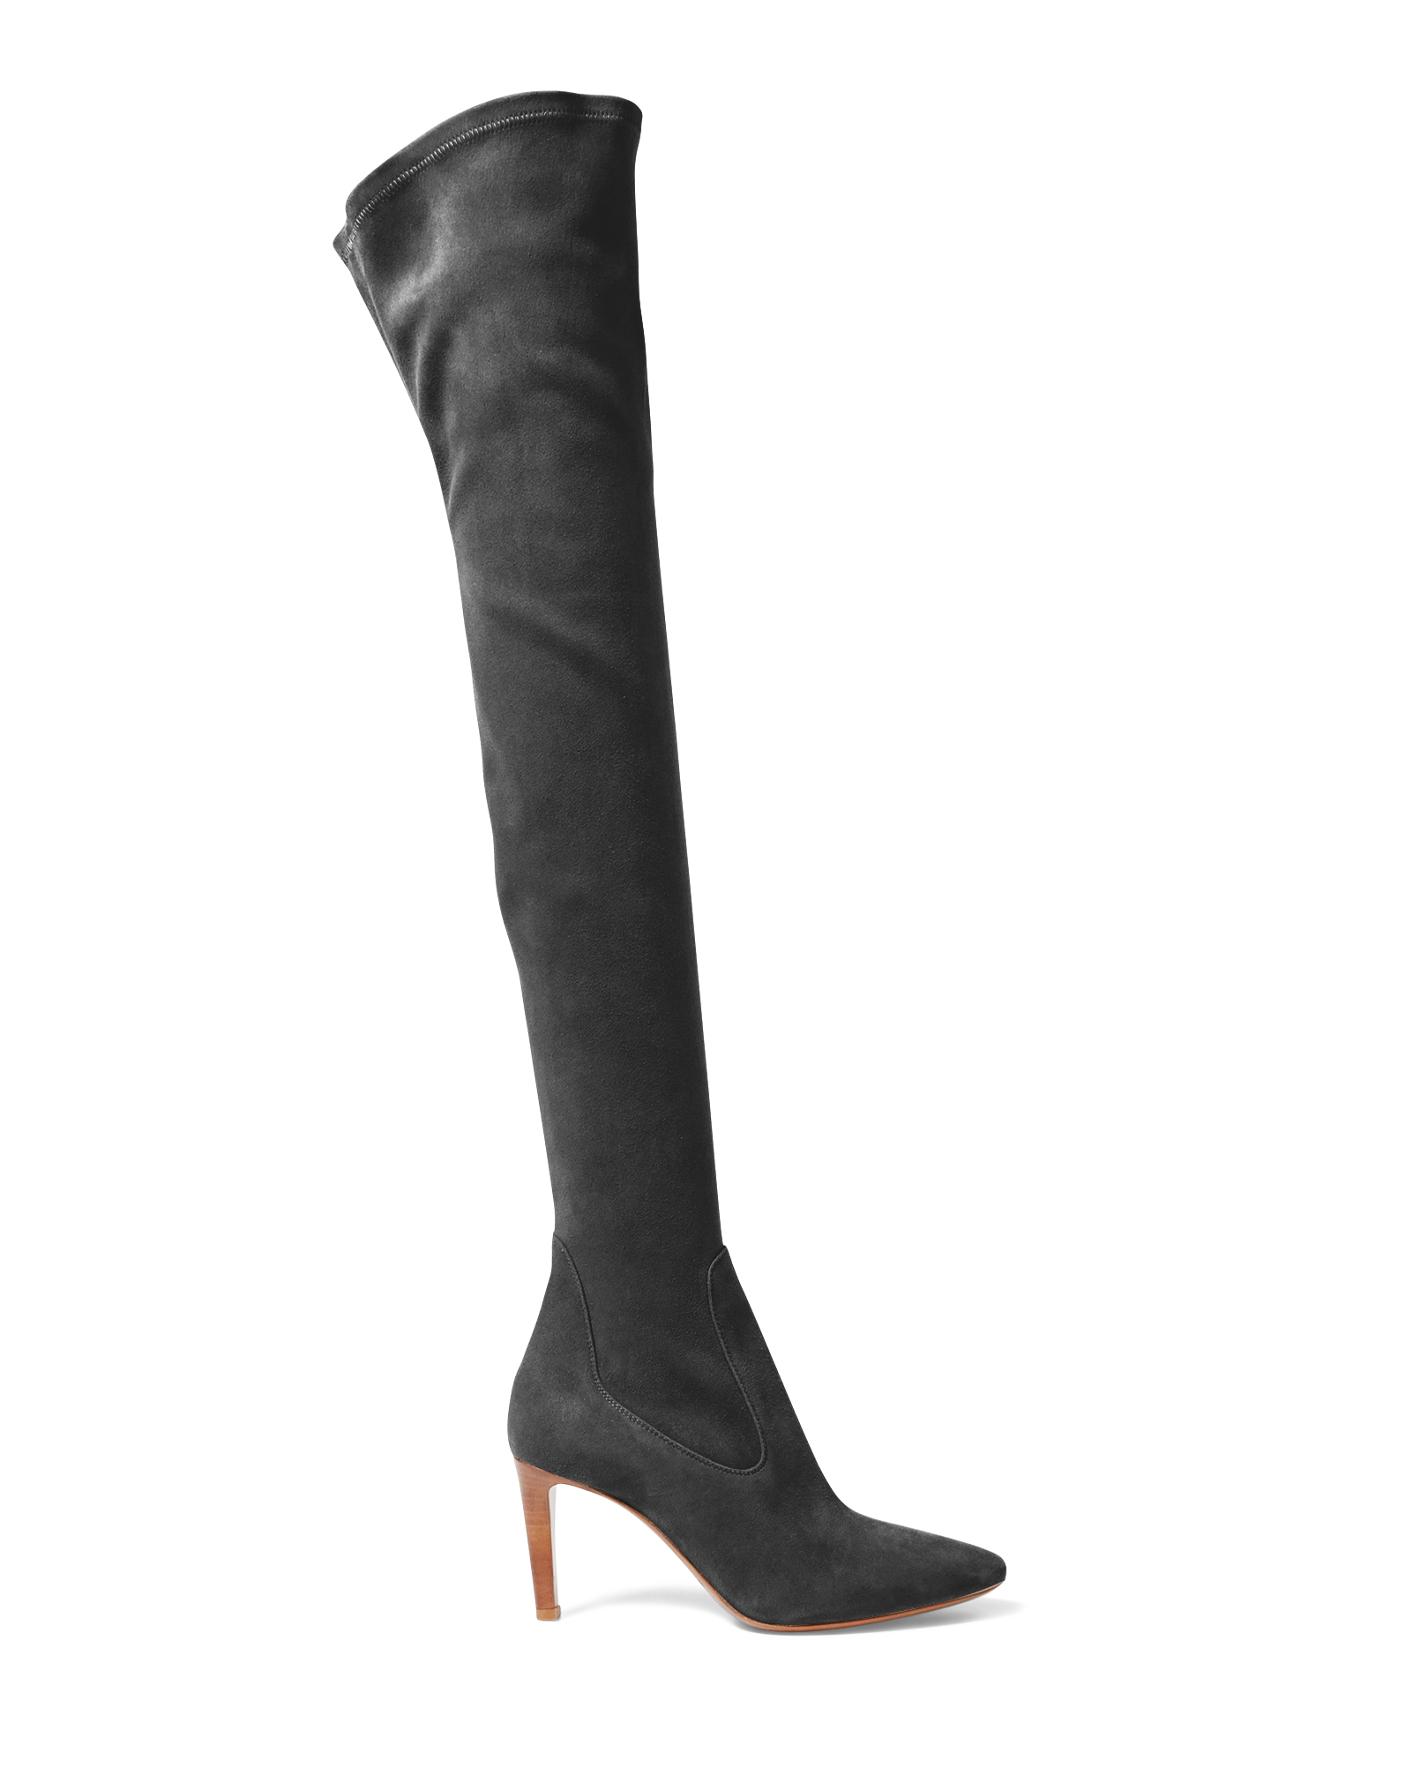 35cf102f1 polo ralph lauren rain boots